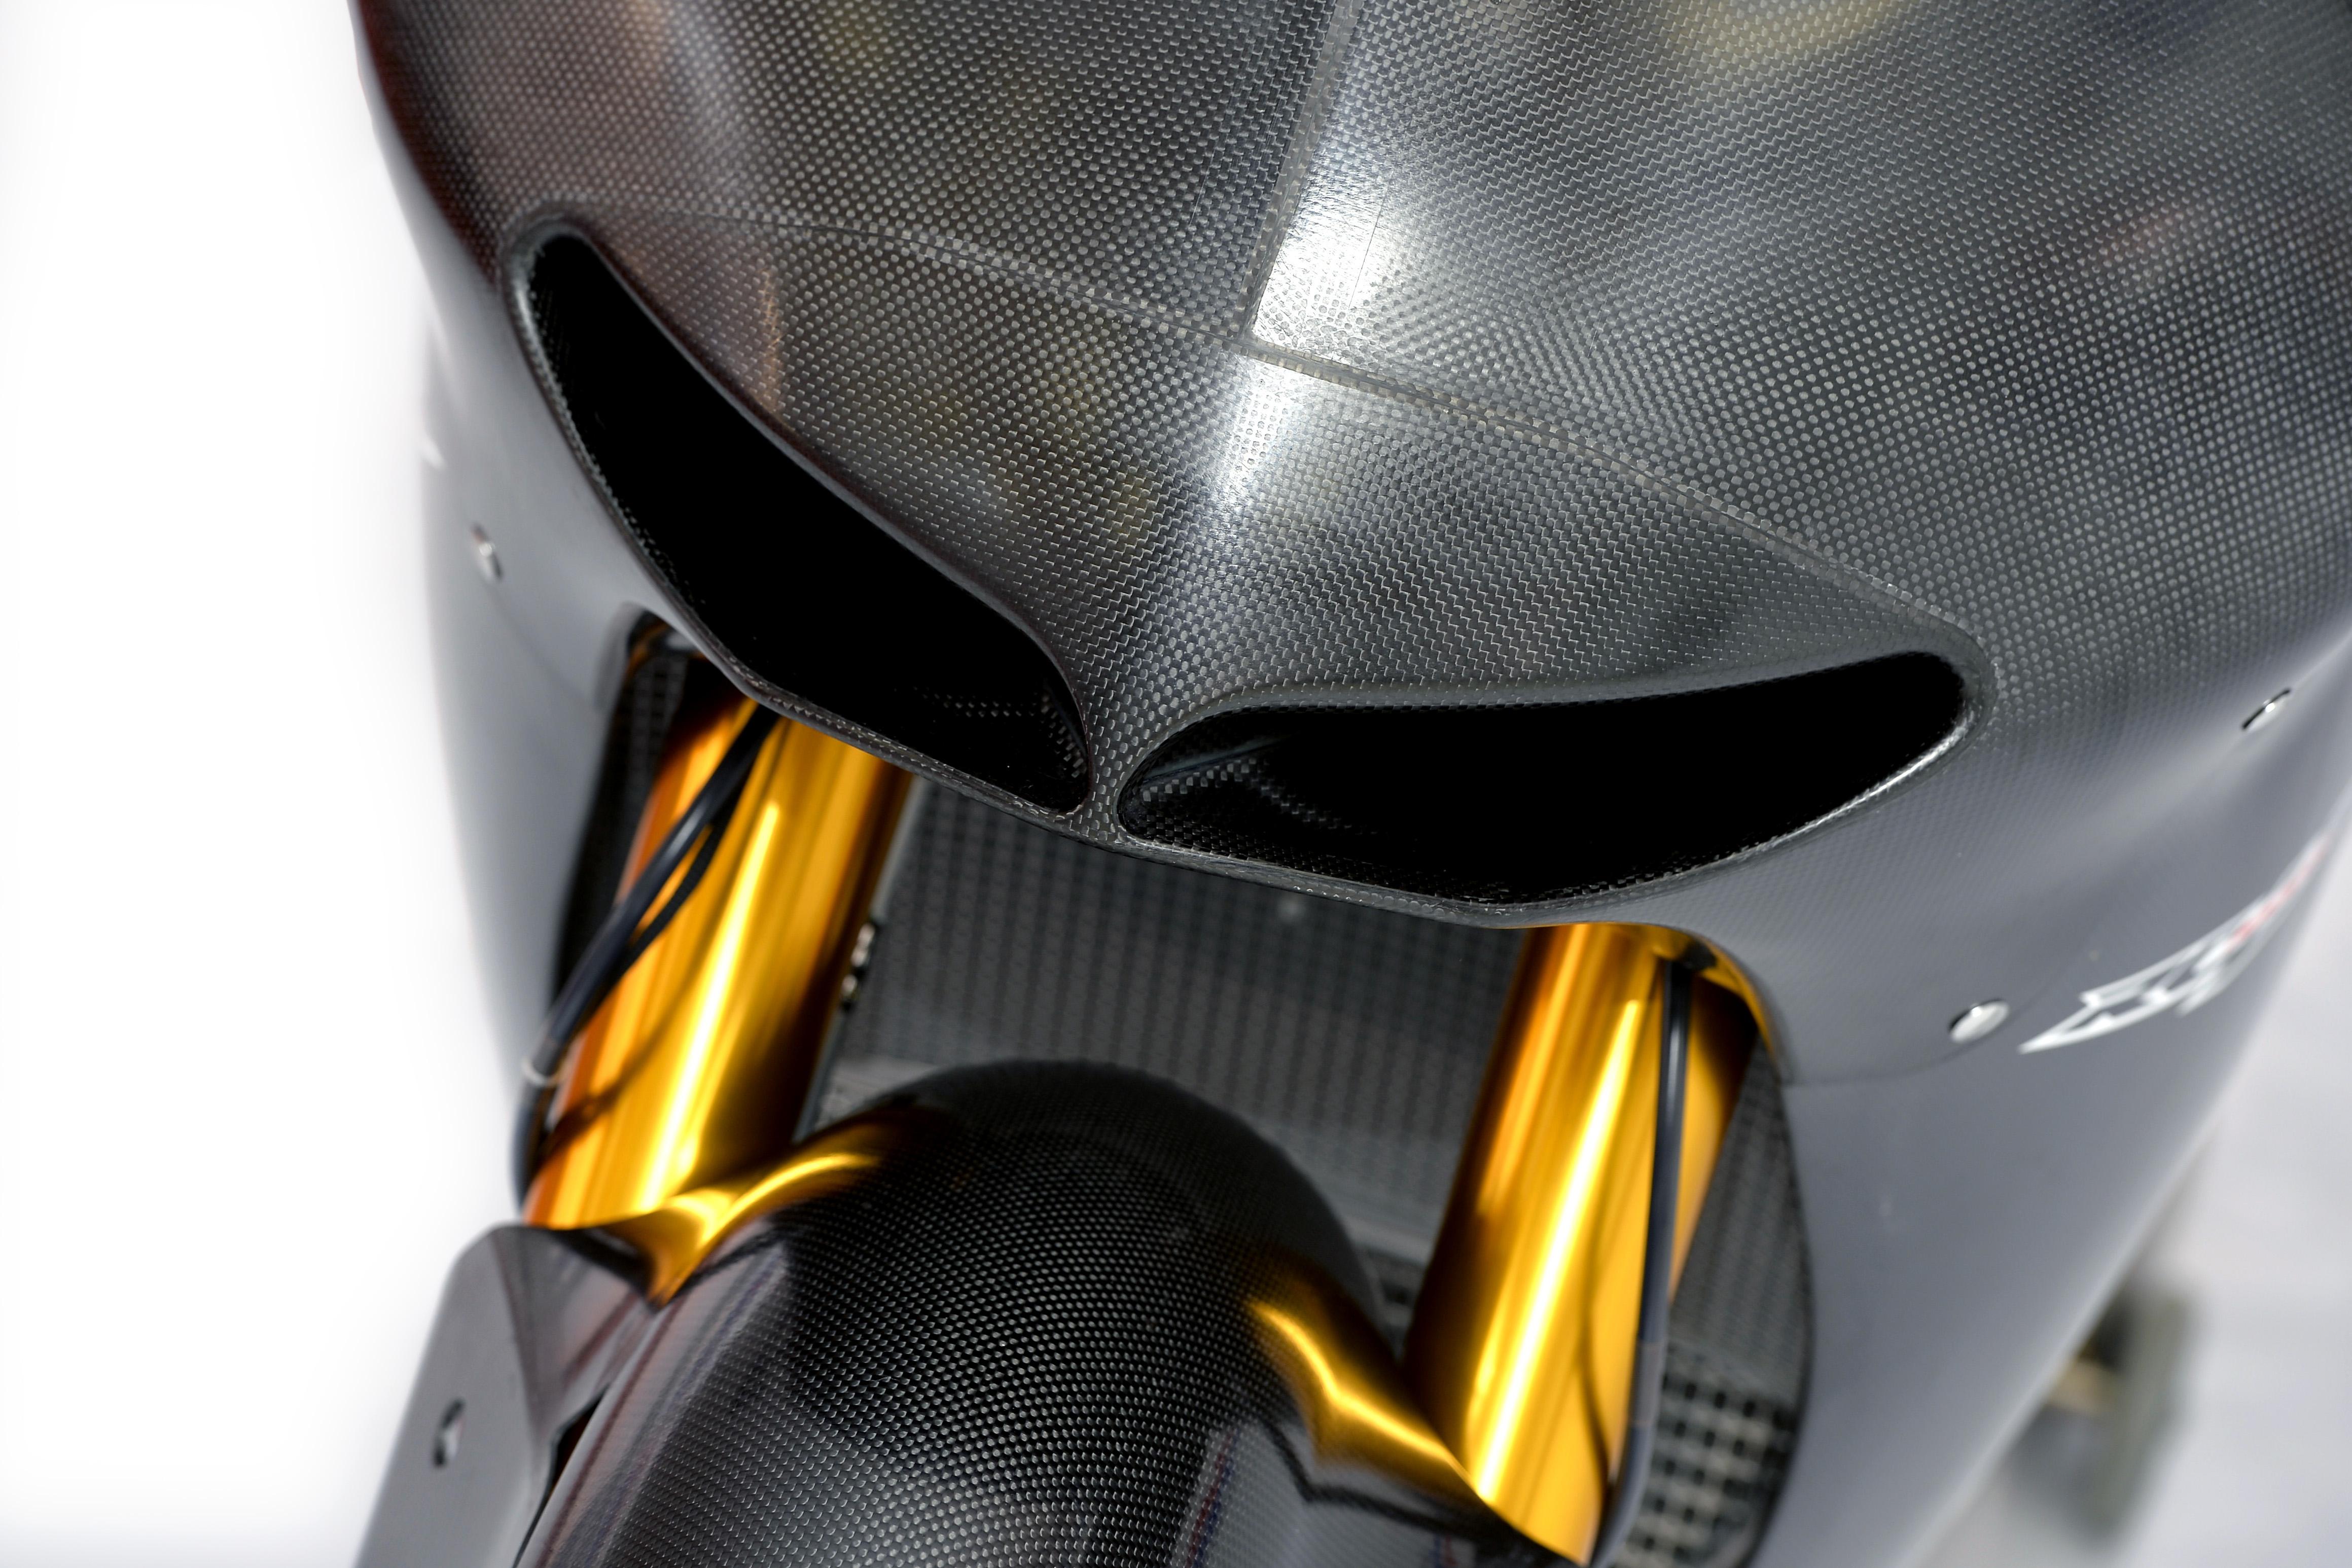 honda_rcv1000r_motogp_production_racer_www_racemoto_com_016